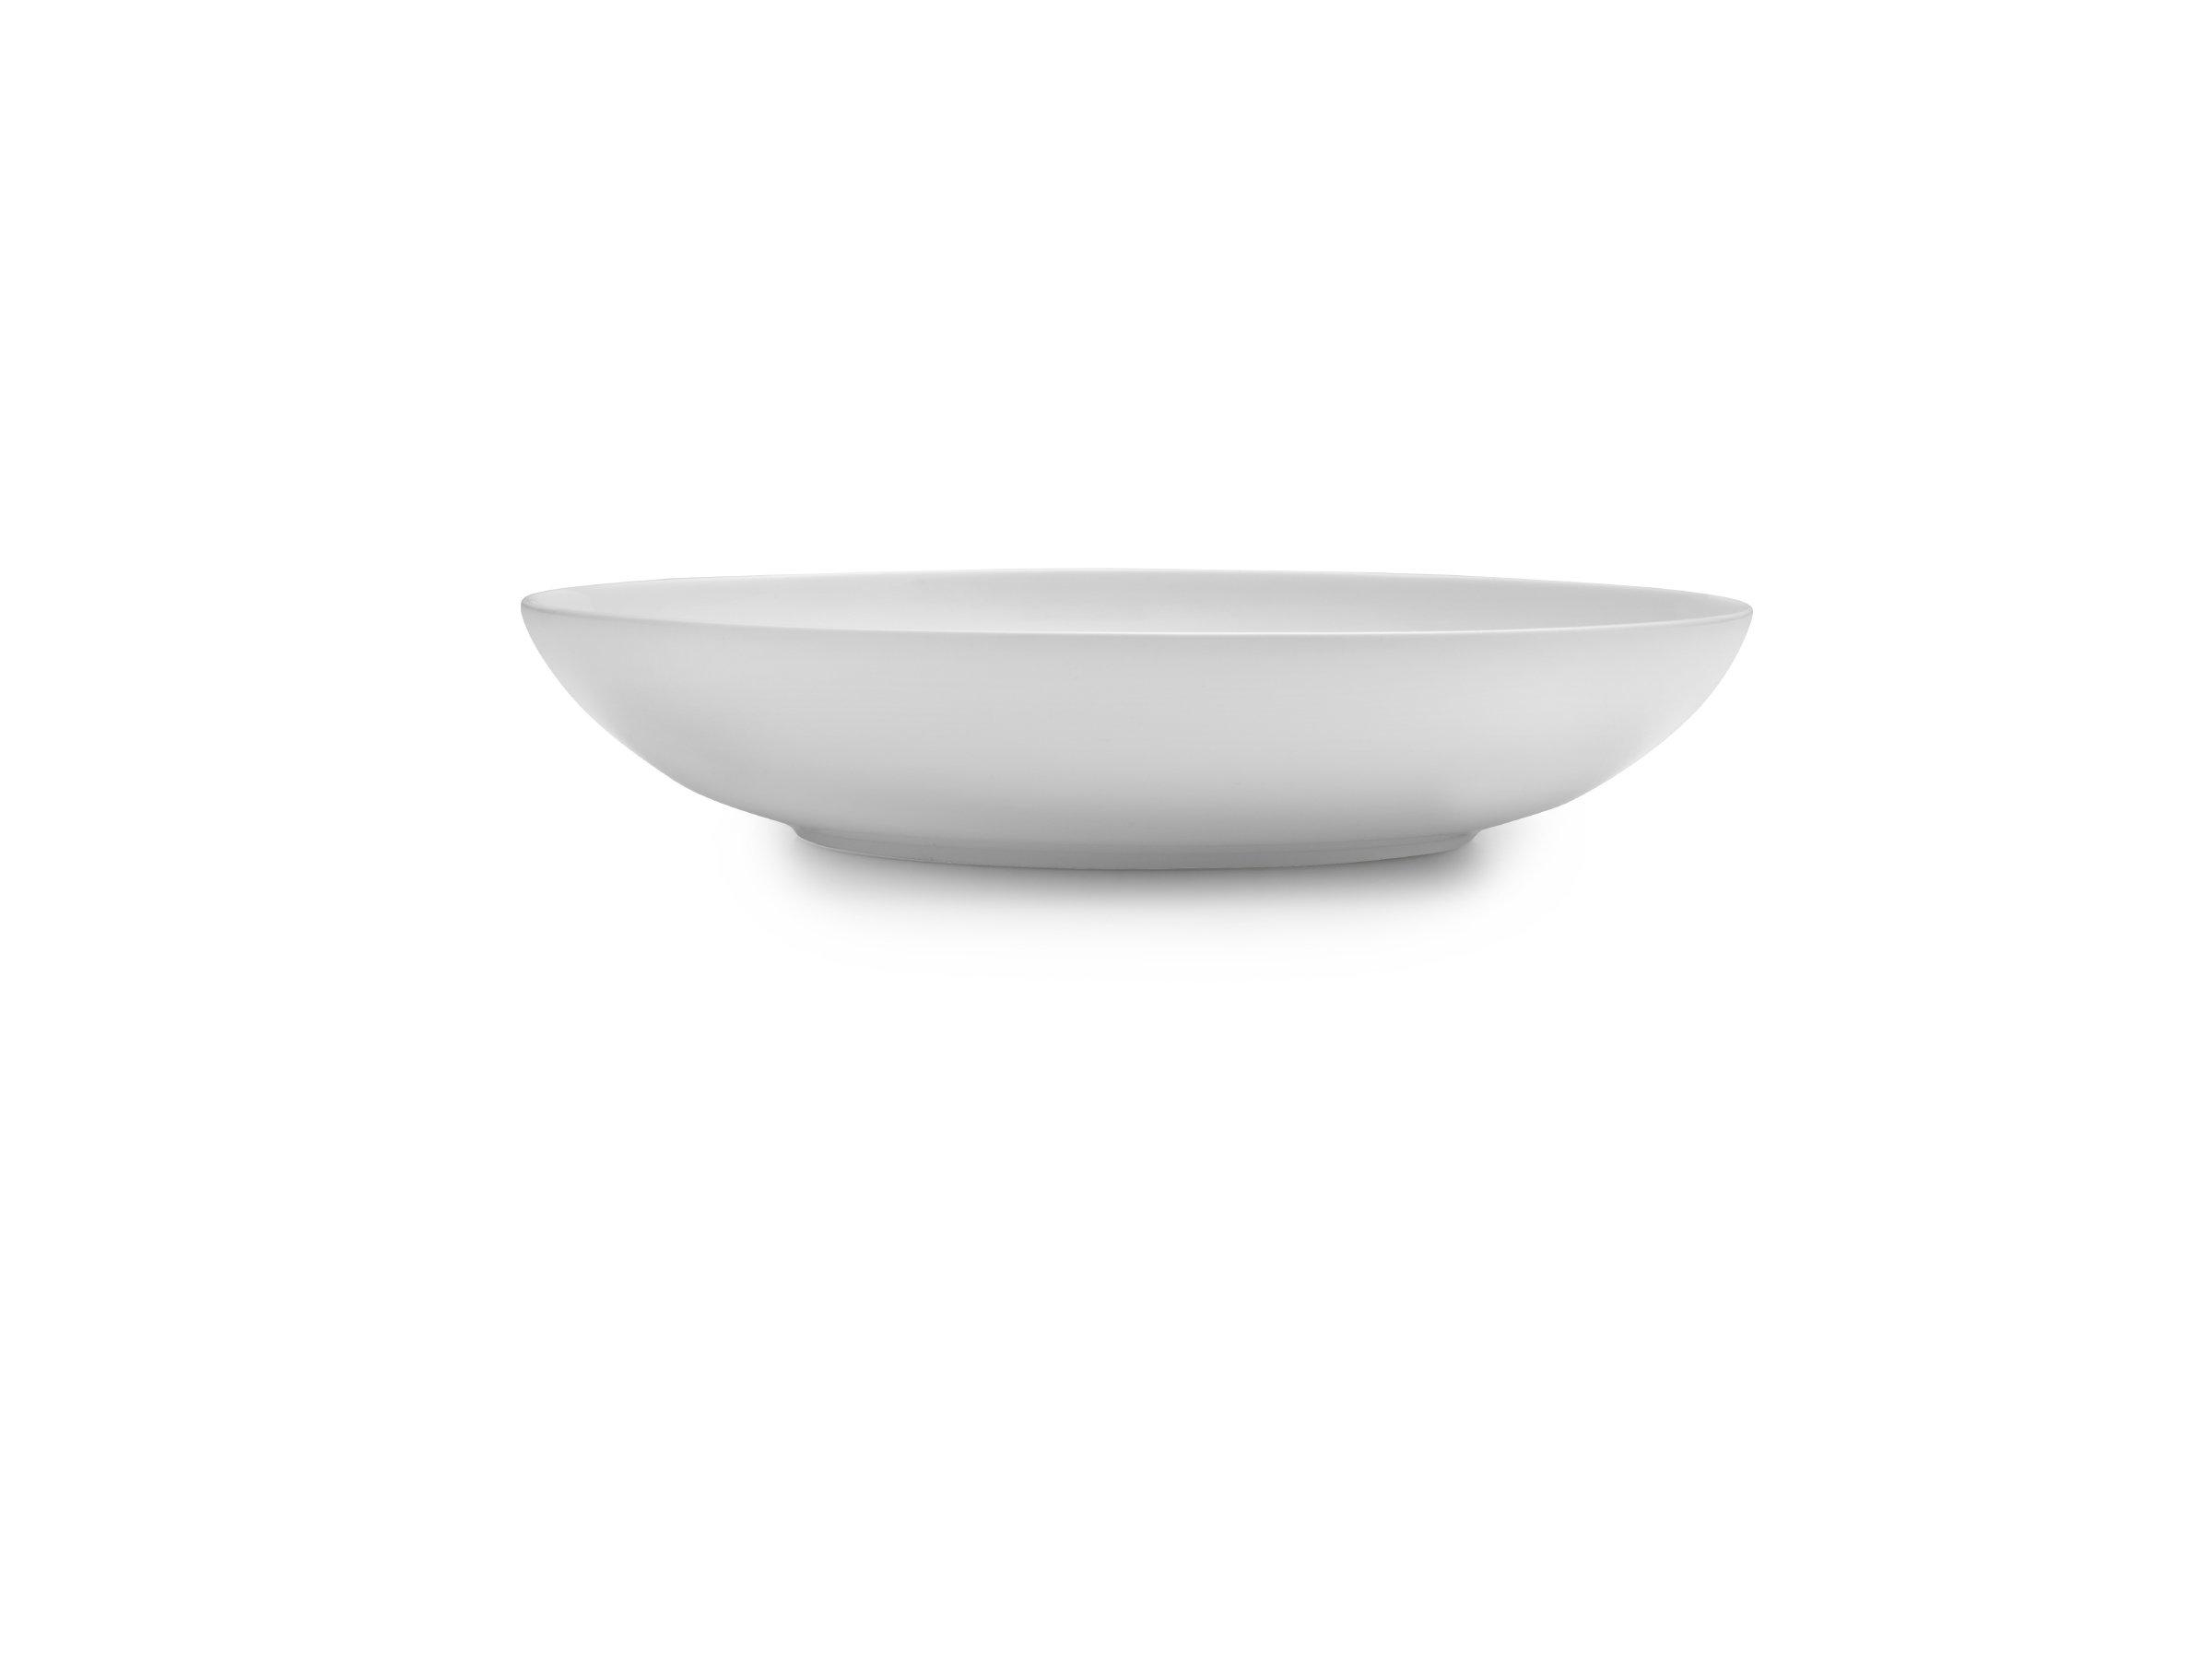 Mikasa Delray Bone China Pasta Bowl, 9-Inch, Set Of 4